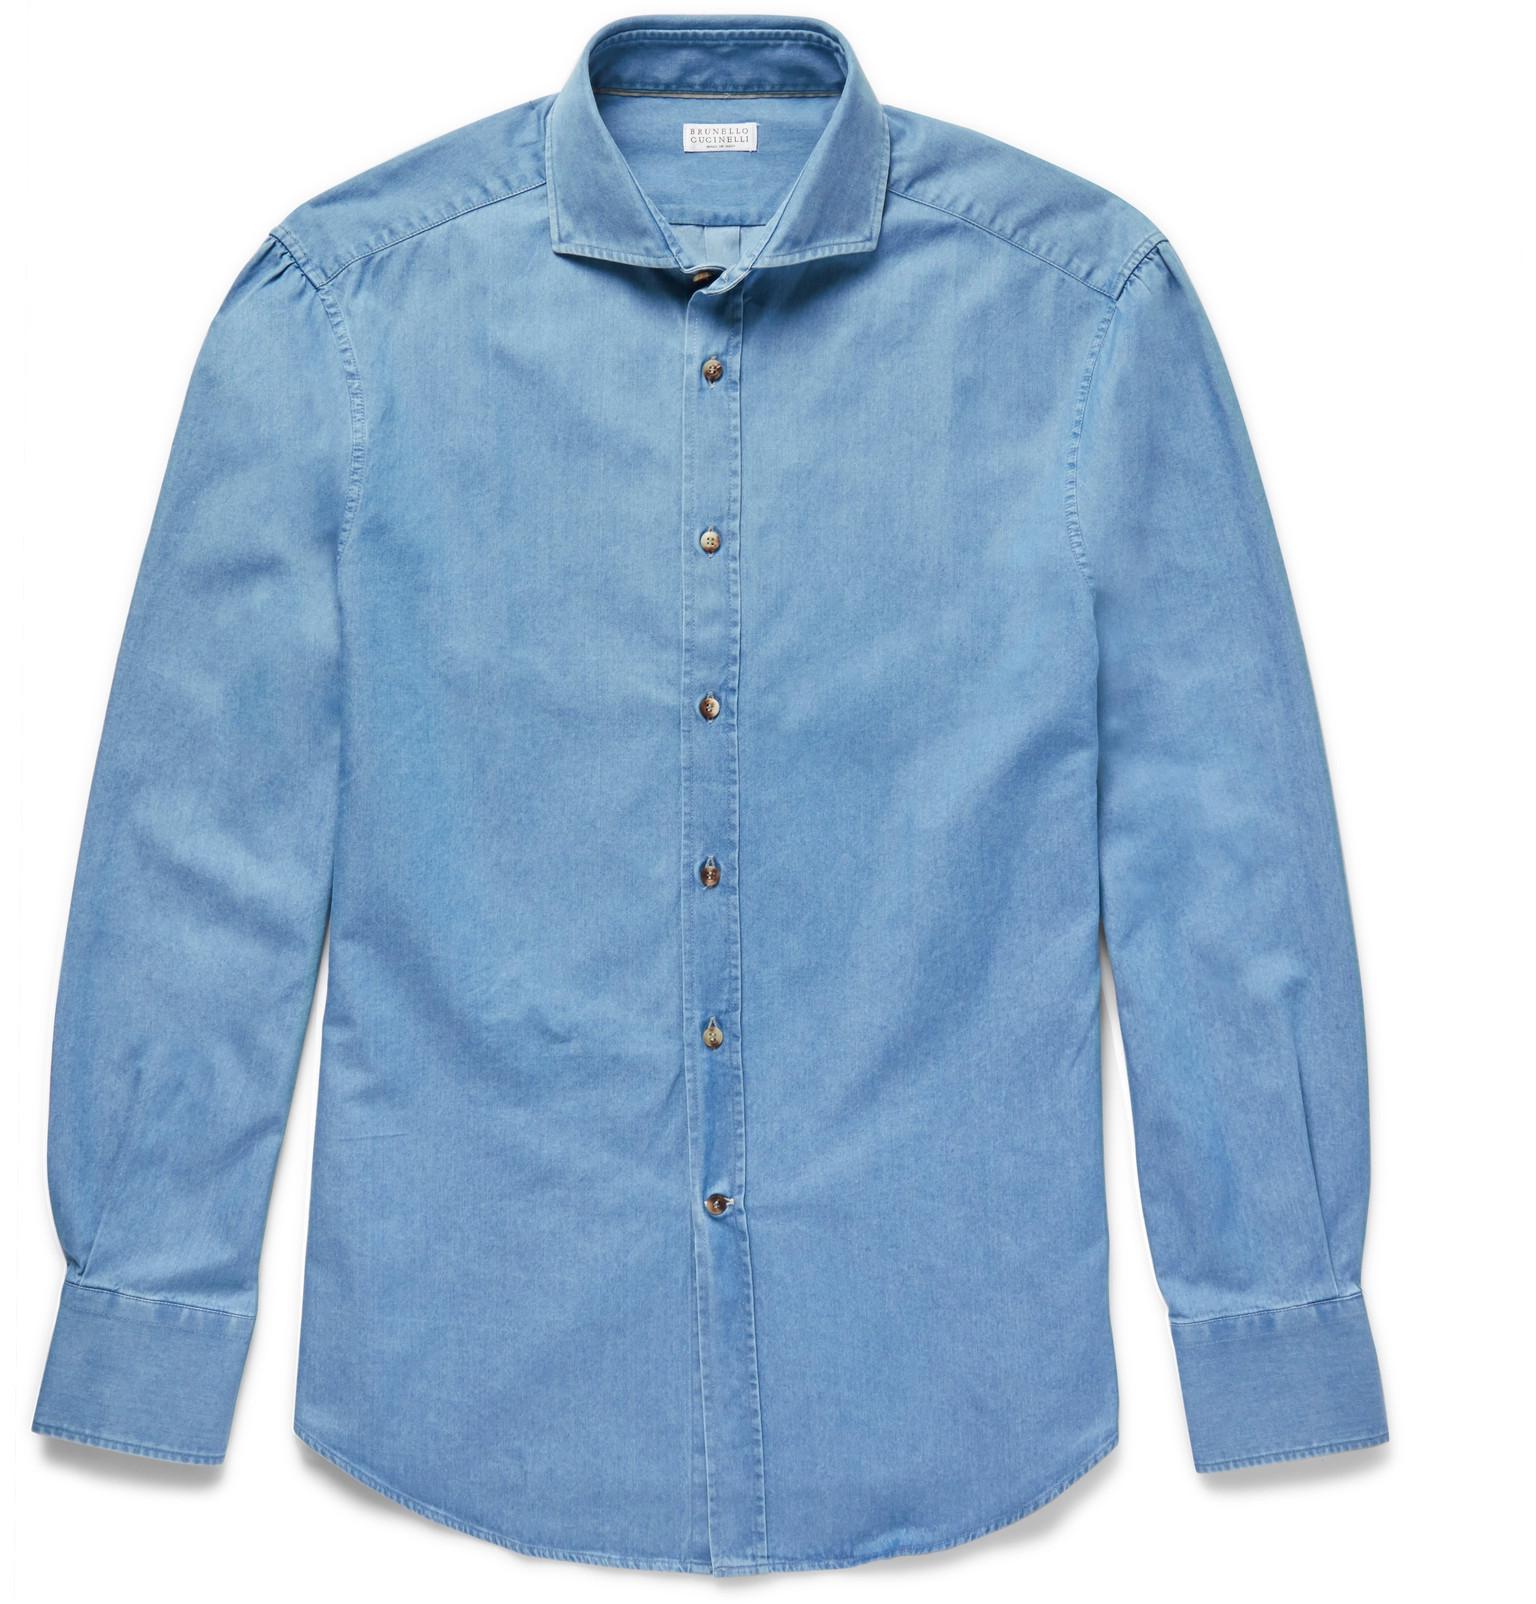 ae8acf6b96 Brunello Cucinelli - Blue Slim-fit Cutaway-collar Washed-denim Shirt for  Men. View fullscreen